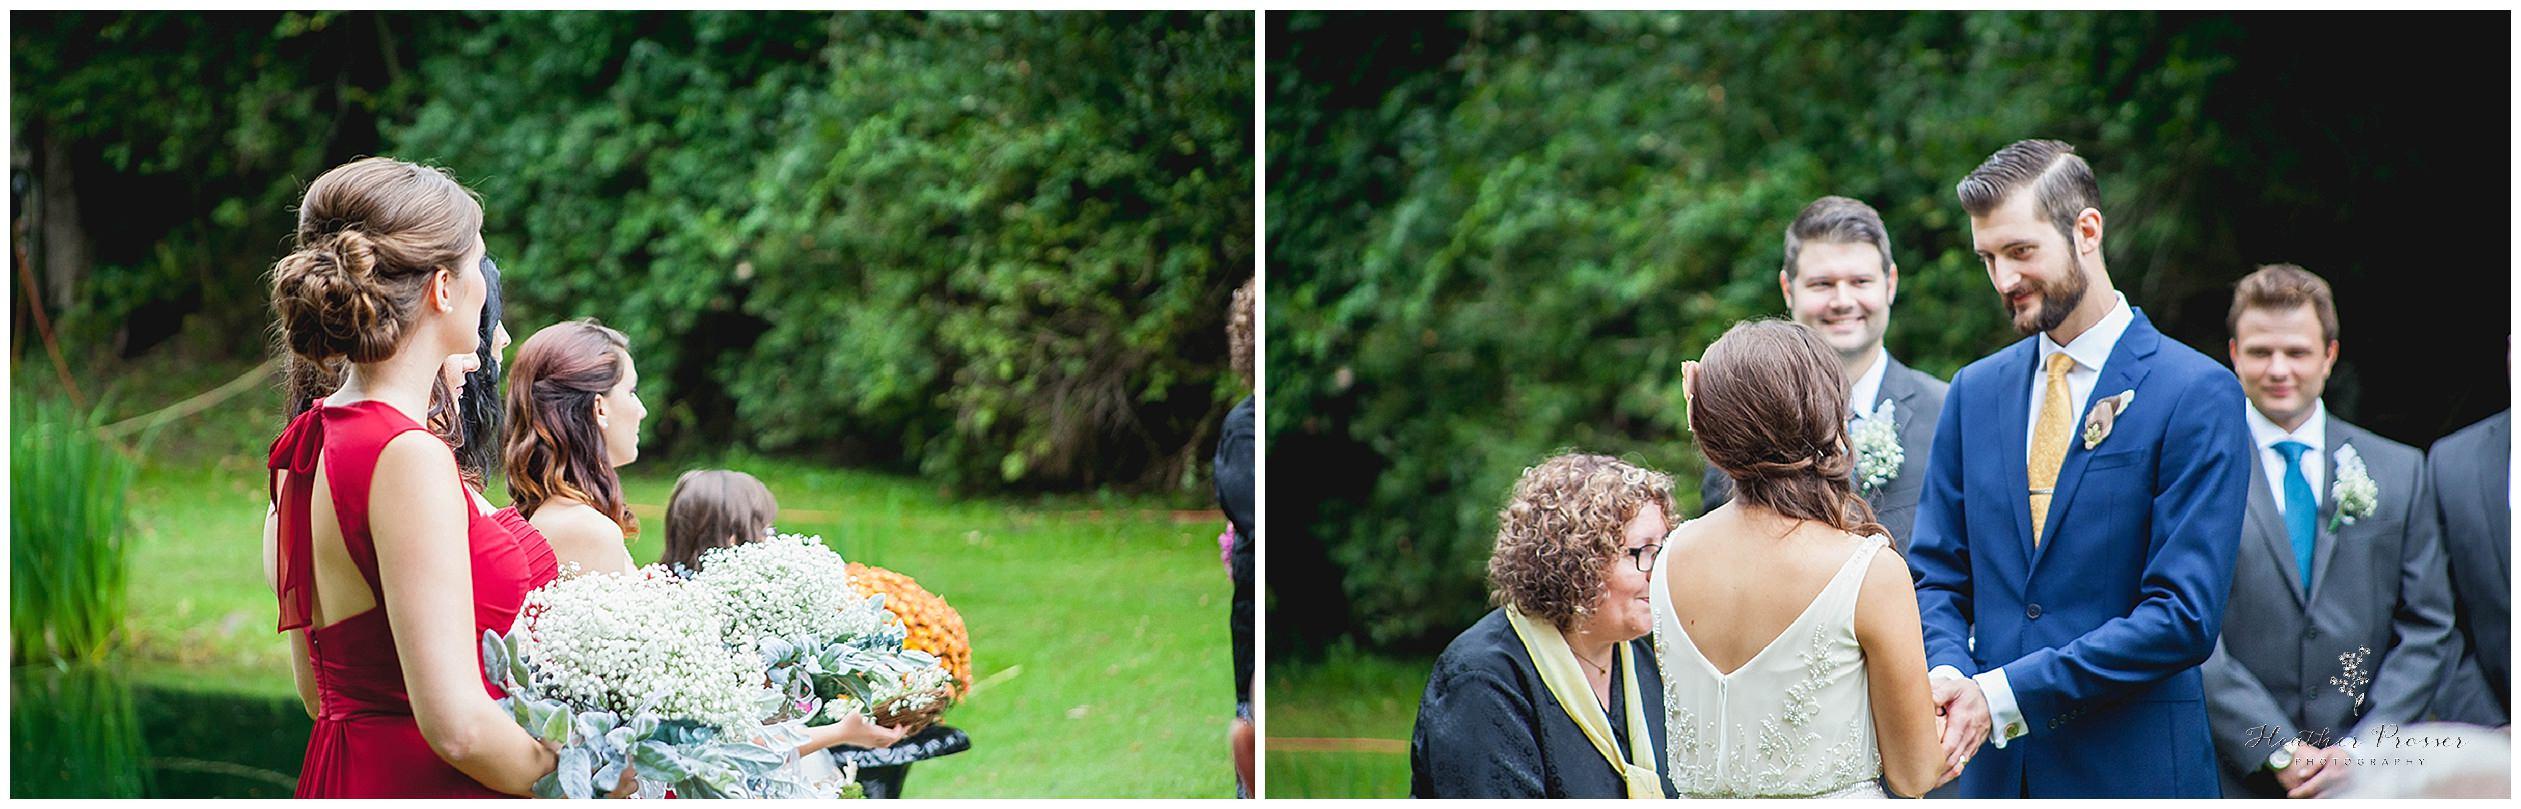 Bowmanville Wedding Photography_0196.jpg